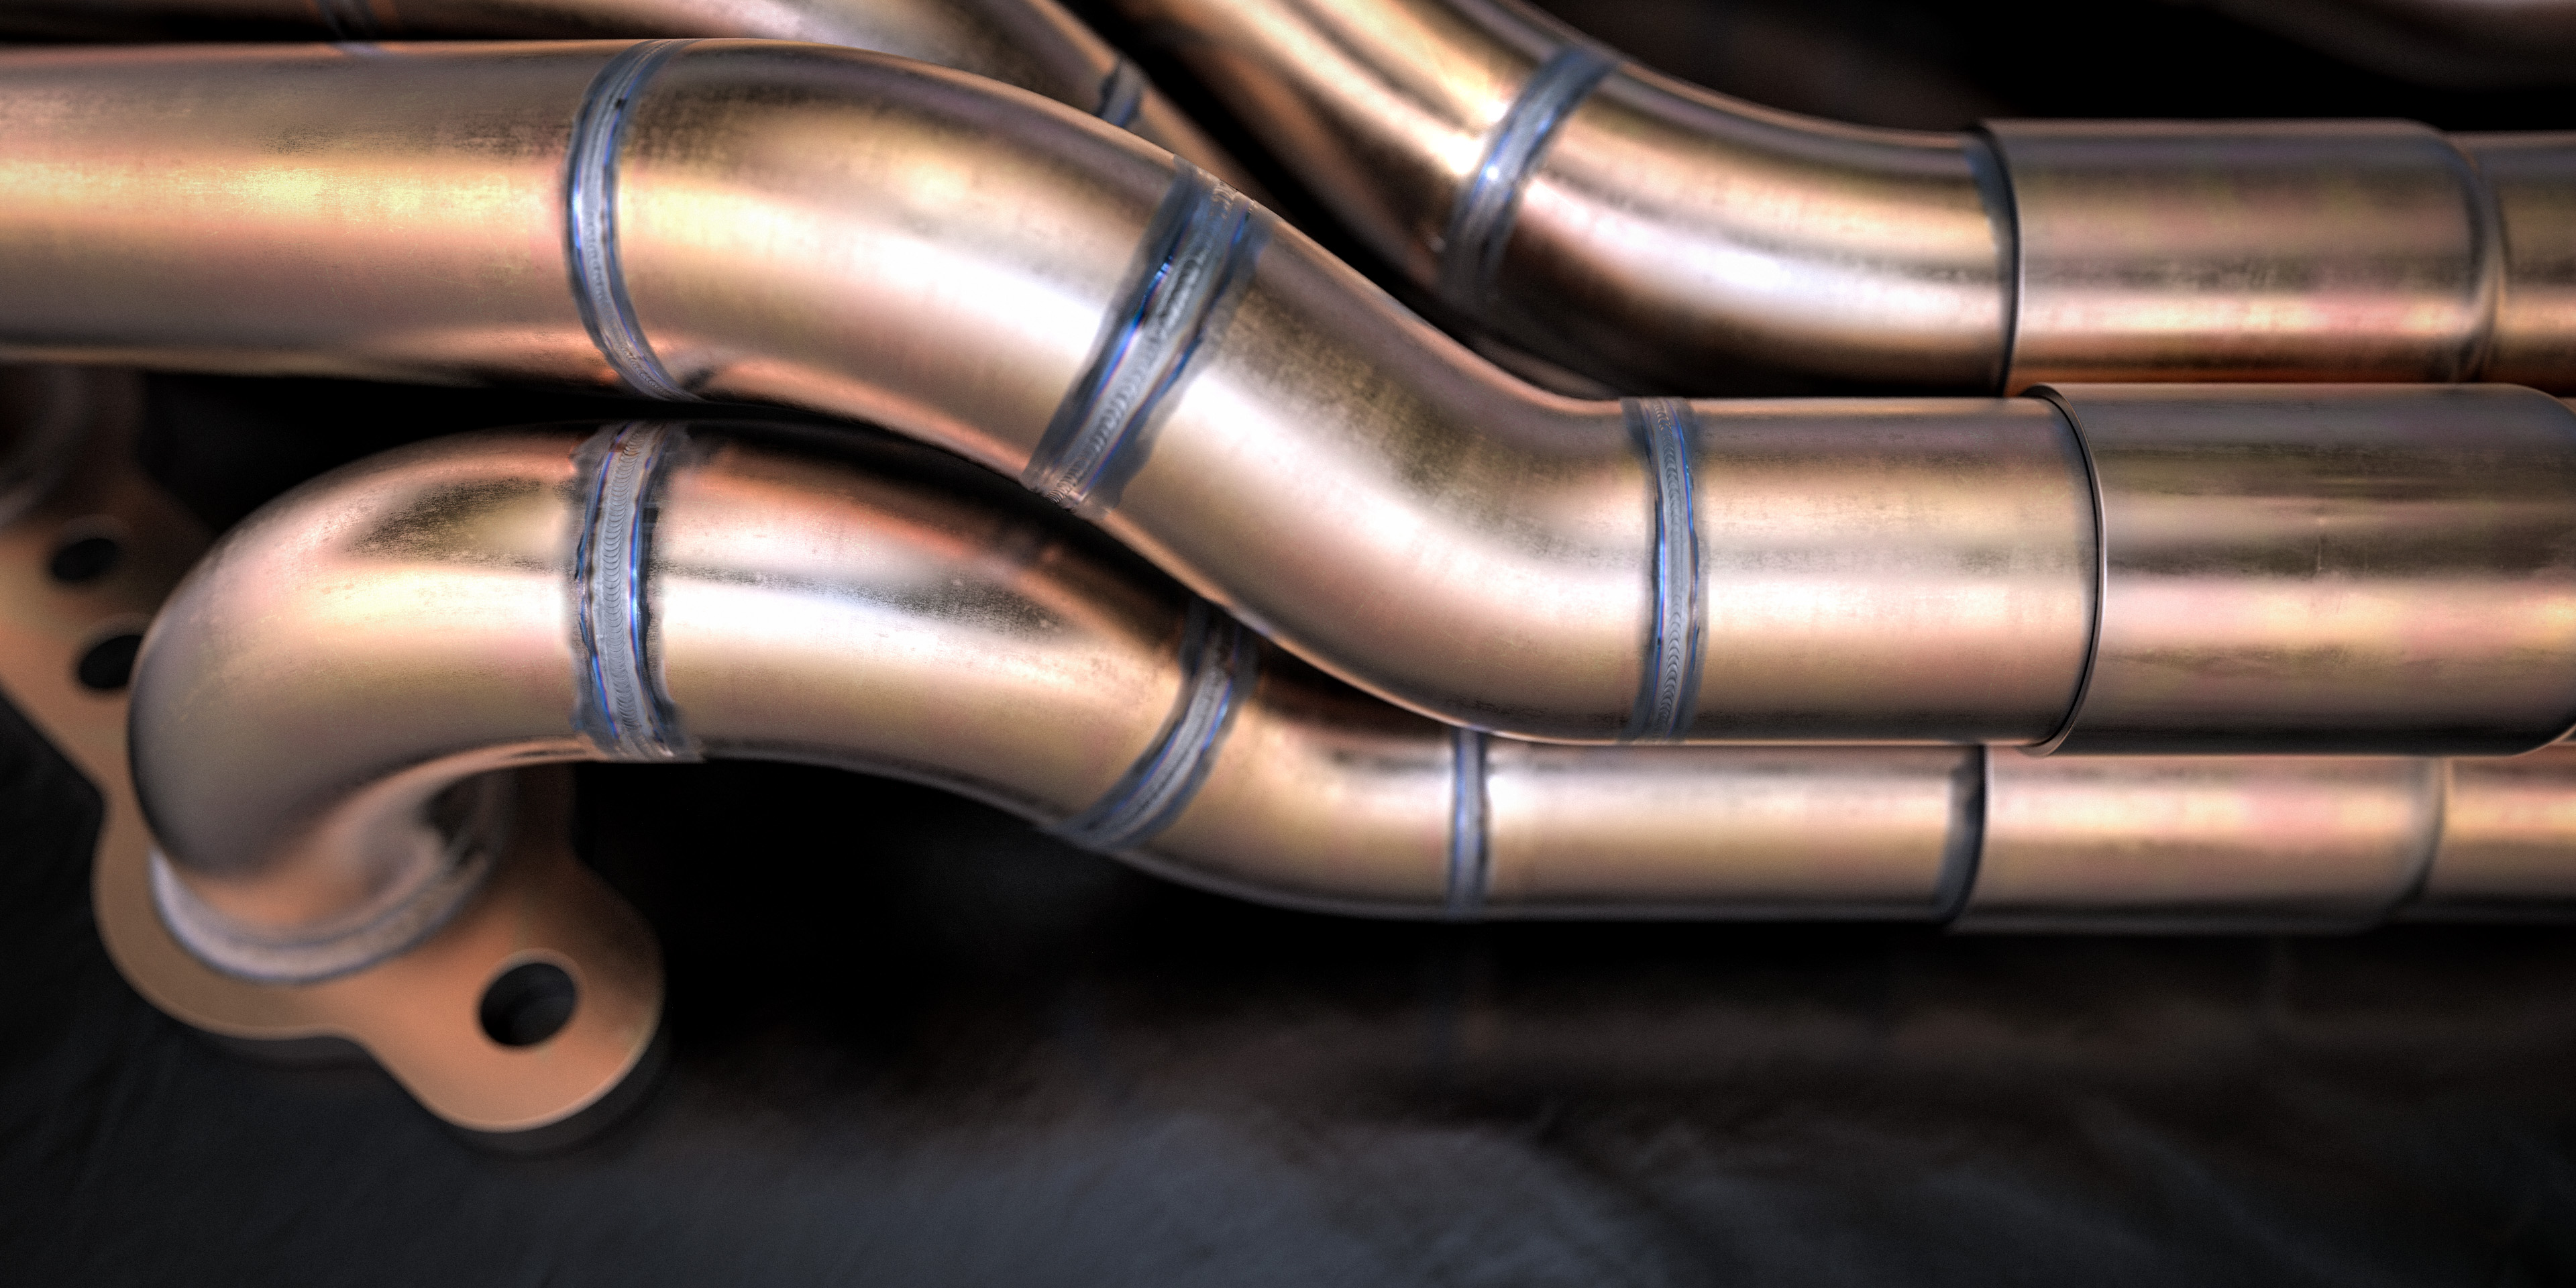 magnus-skogsfjord-nx-keyshot-manifold-welds-02